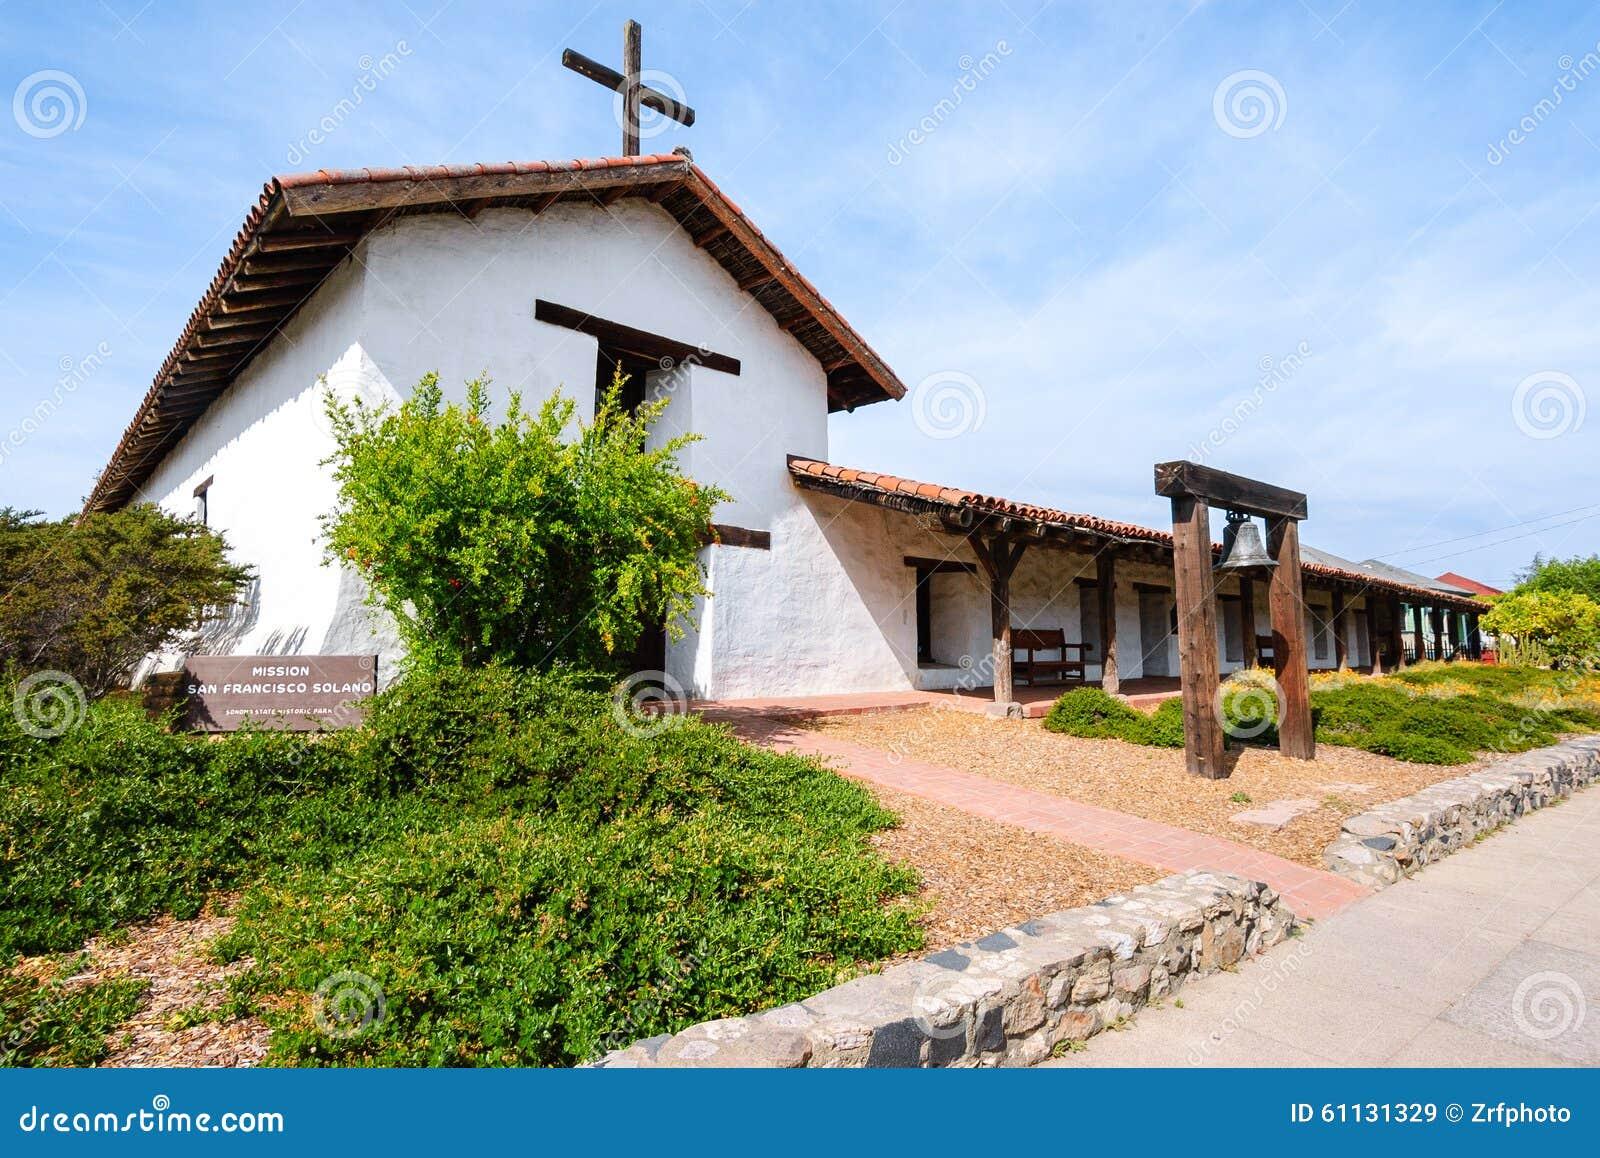 Download Mission San Francisco Solano Stock Image - Image of mission, catholic: 61131329